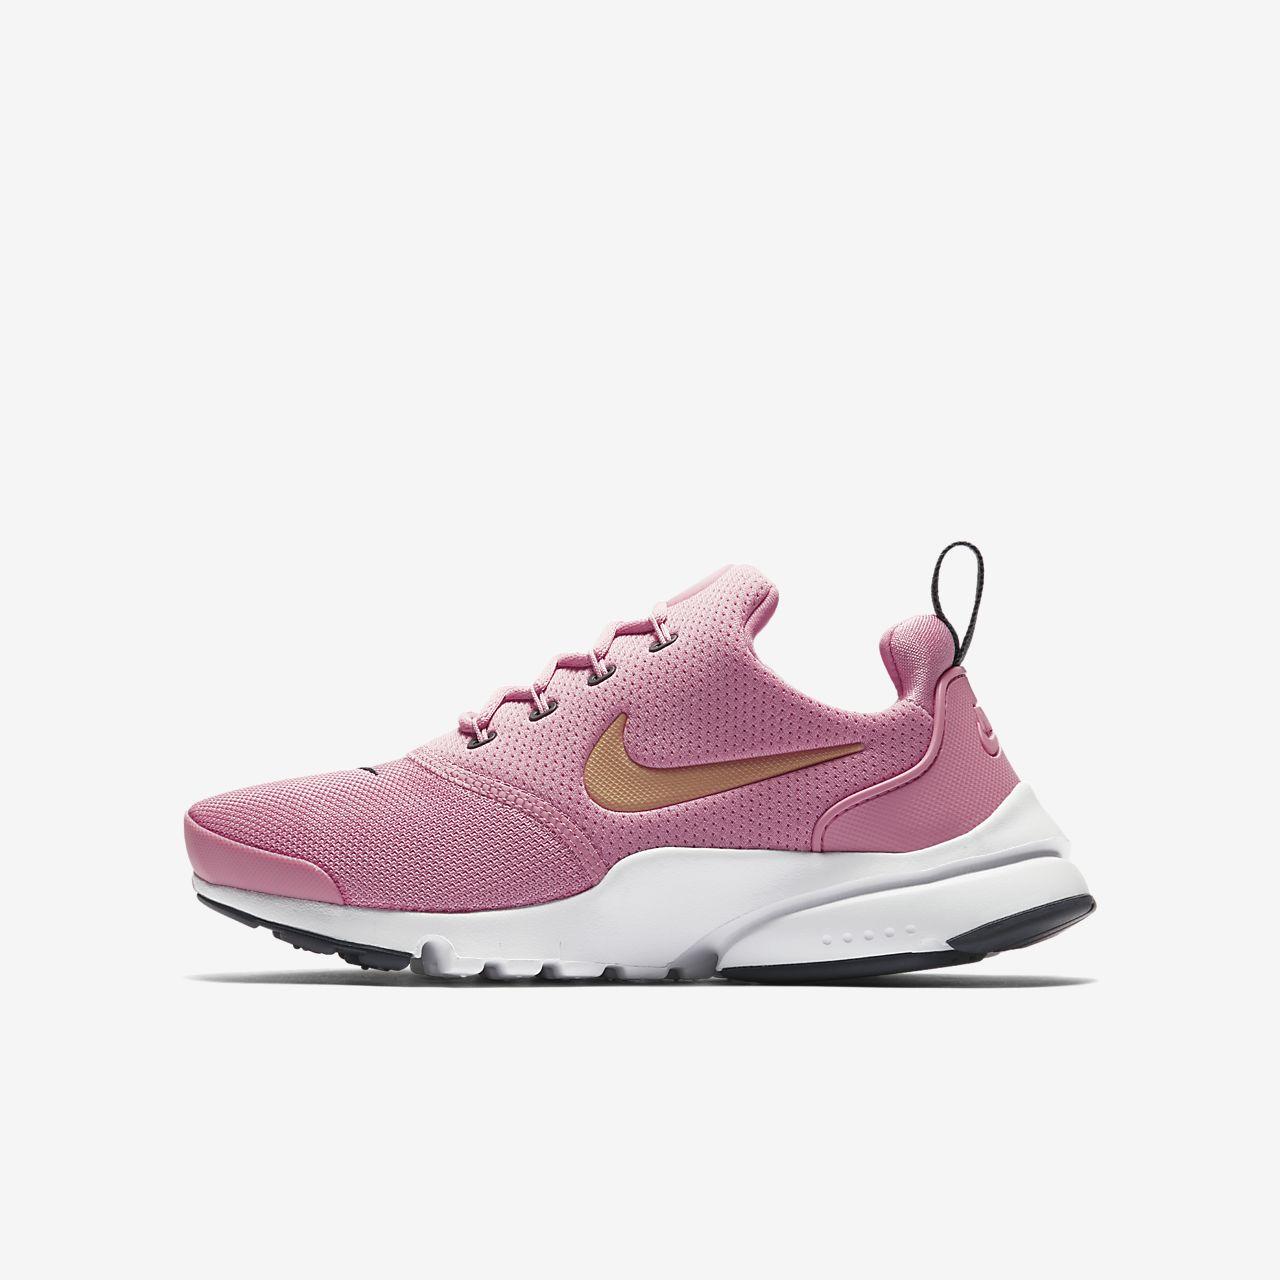 98664177077 Nike Presto Fly Older Kids  Shoe. Nike.com SA